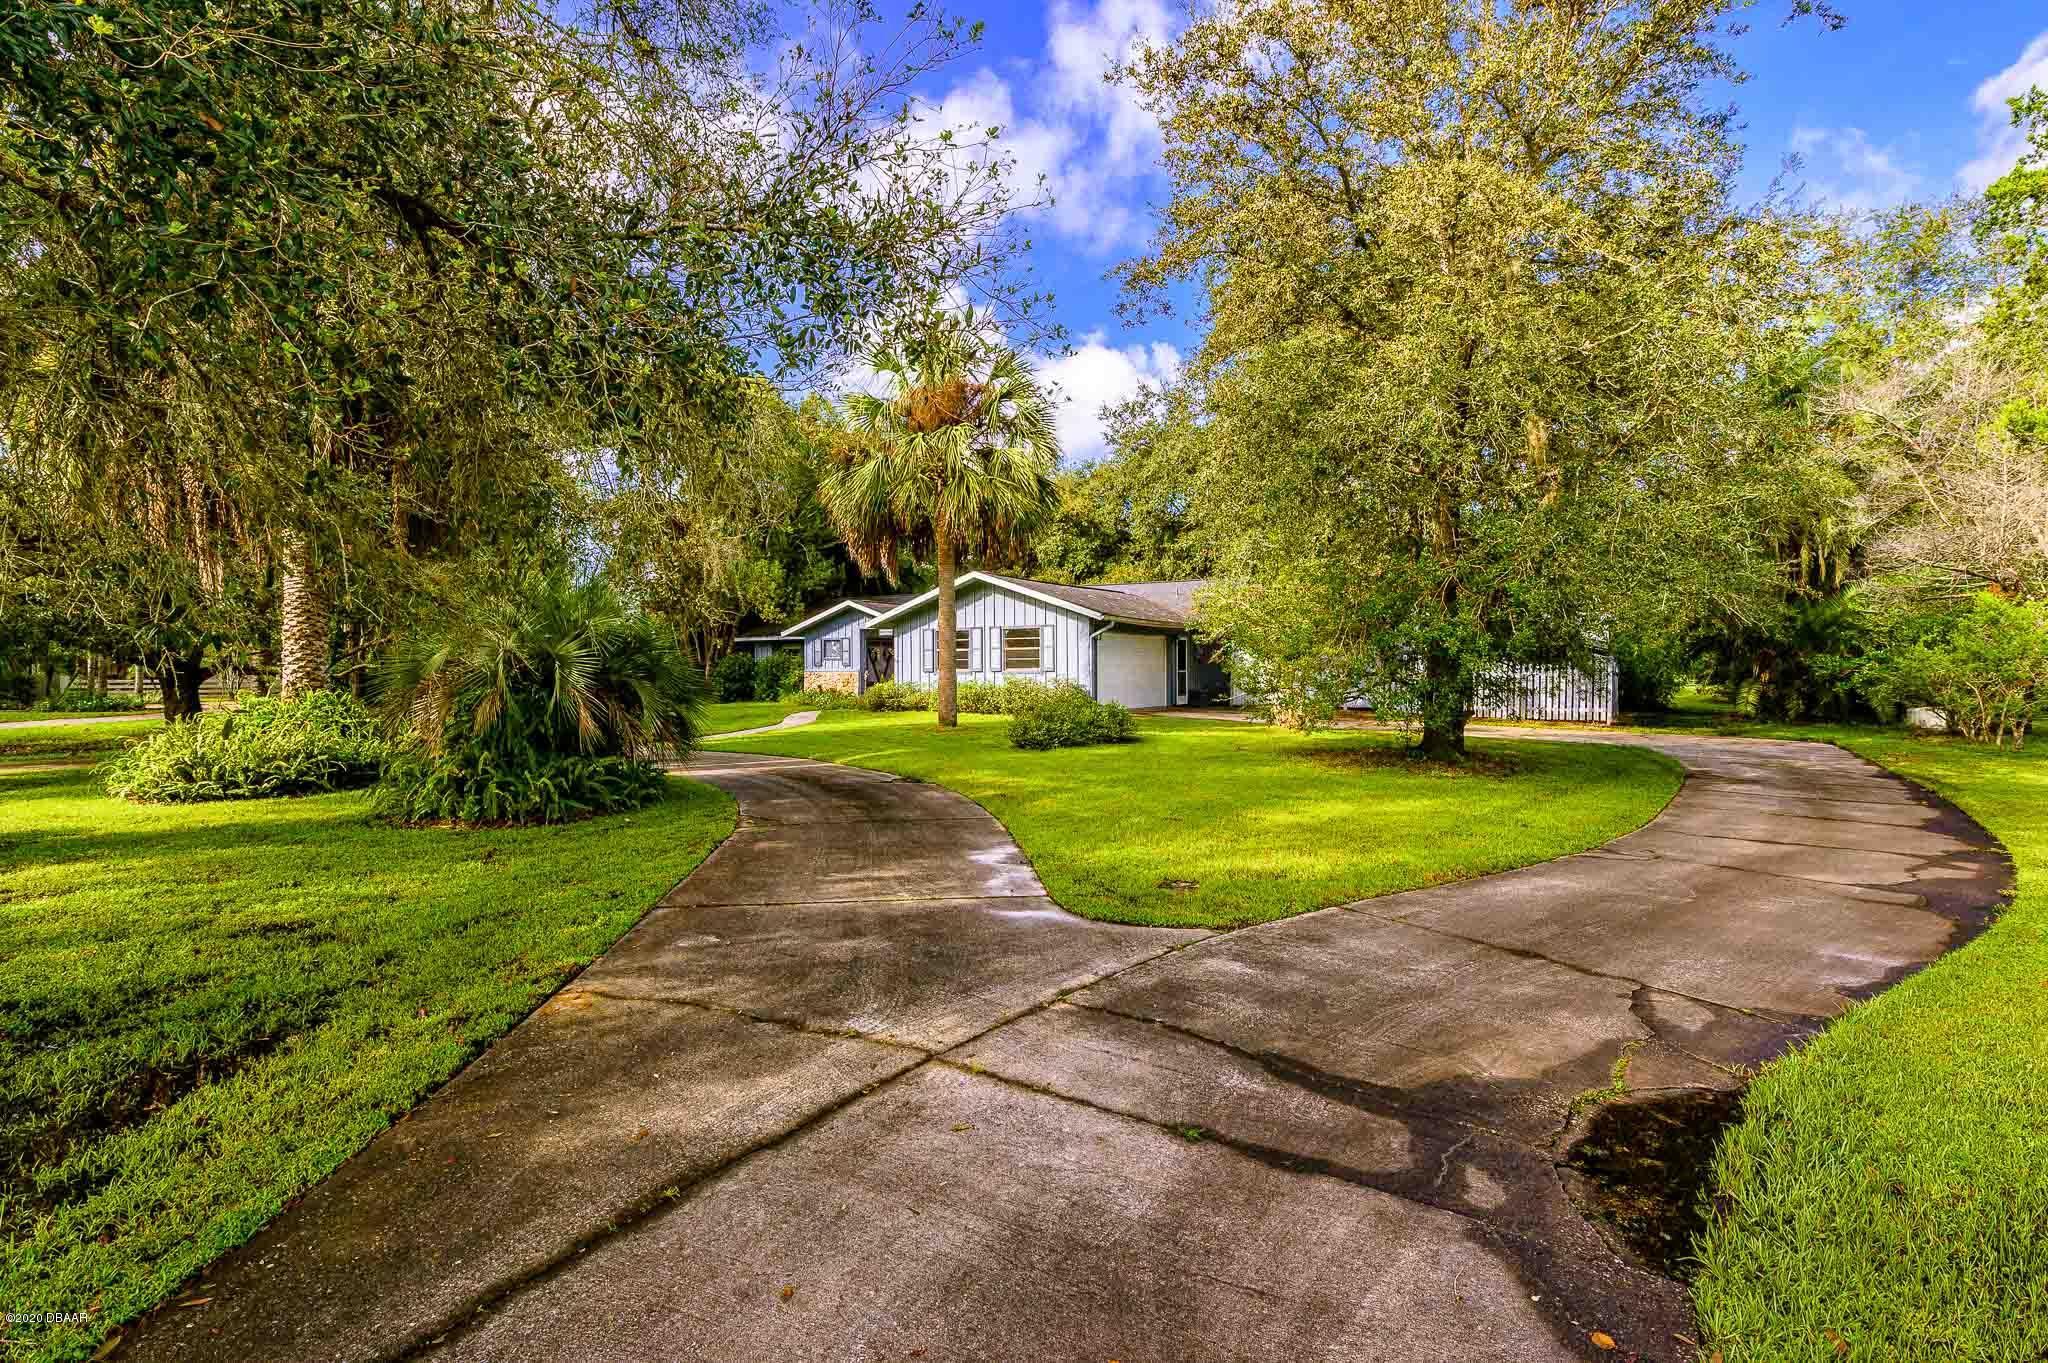 Photo of 170 E Lakeside Drive, Port Orange, FL 32128